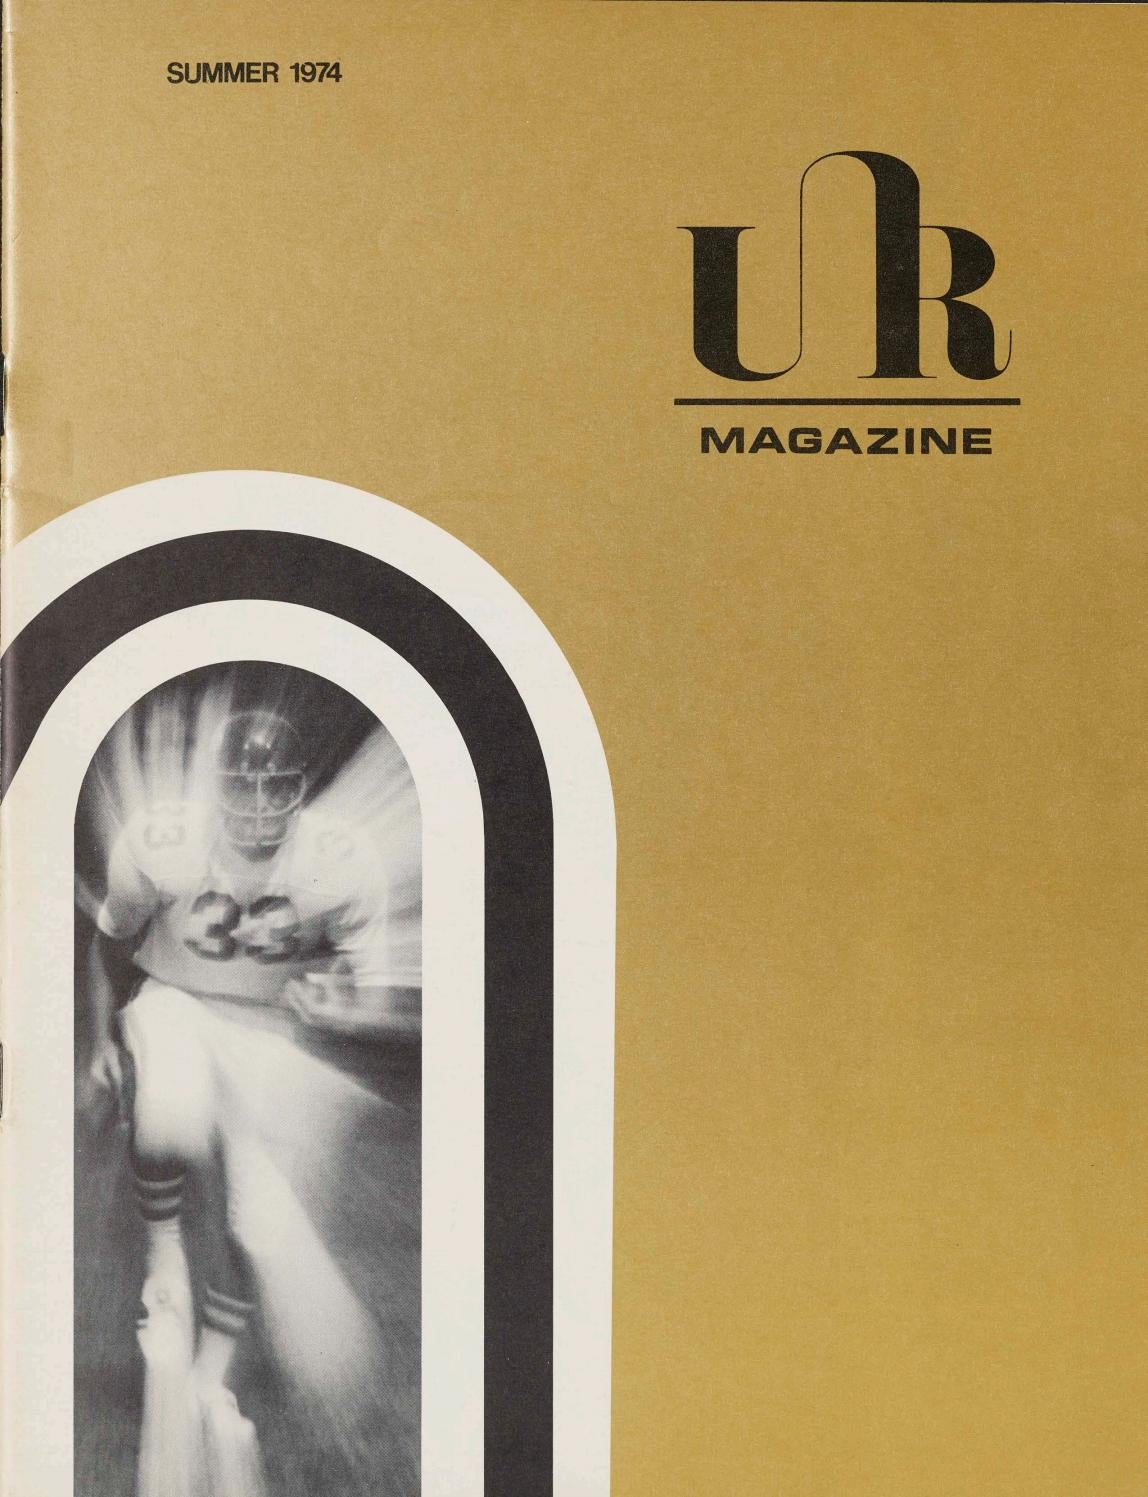 University Of Richmond Magazine Summer 1974 By Ur Scholarship Repository Issuu